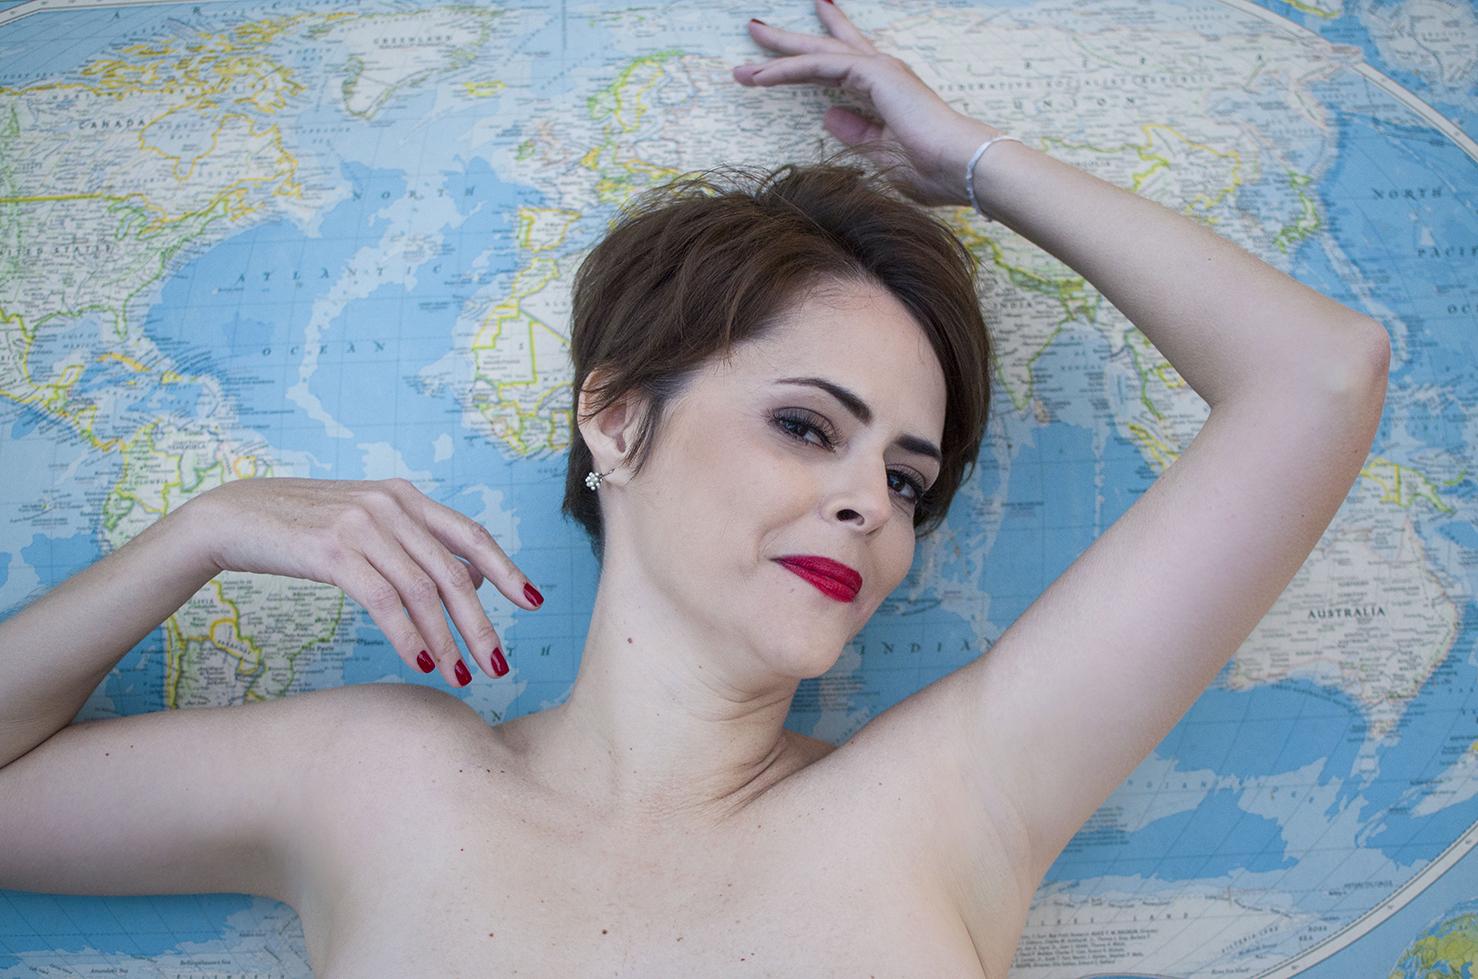 ensaio-fotográfico-temático-viagem-mapa-mundi-nú-sensual-curitiba